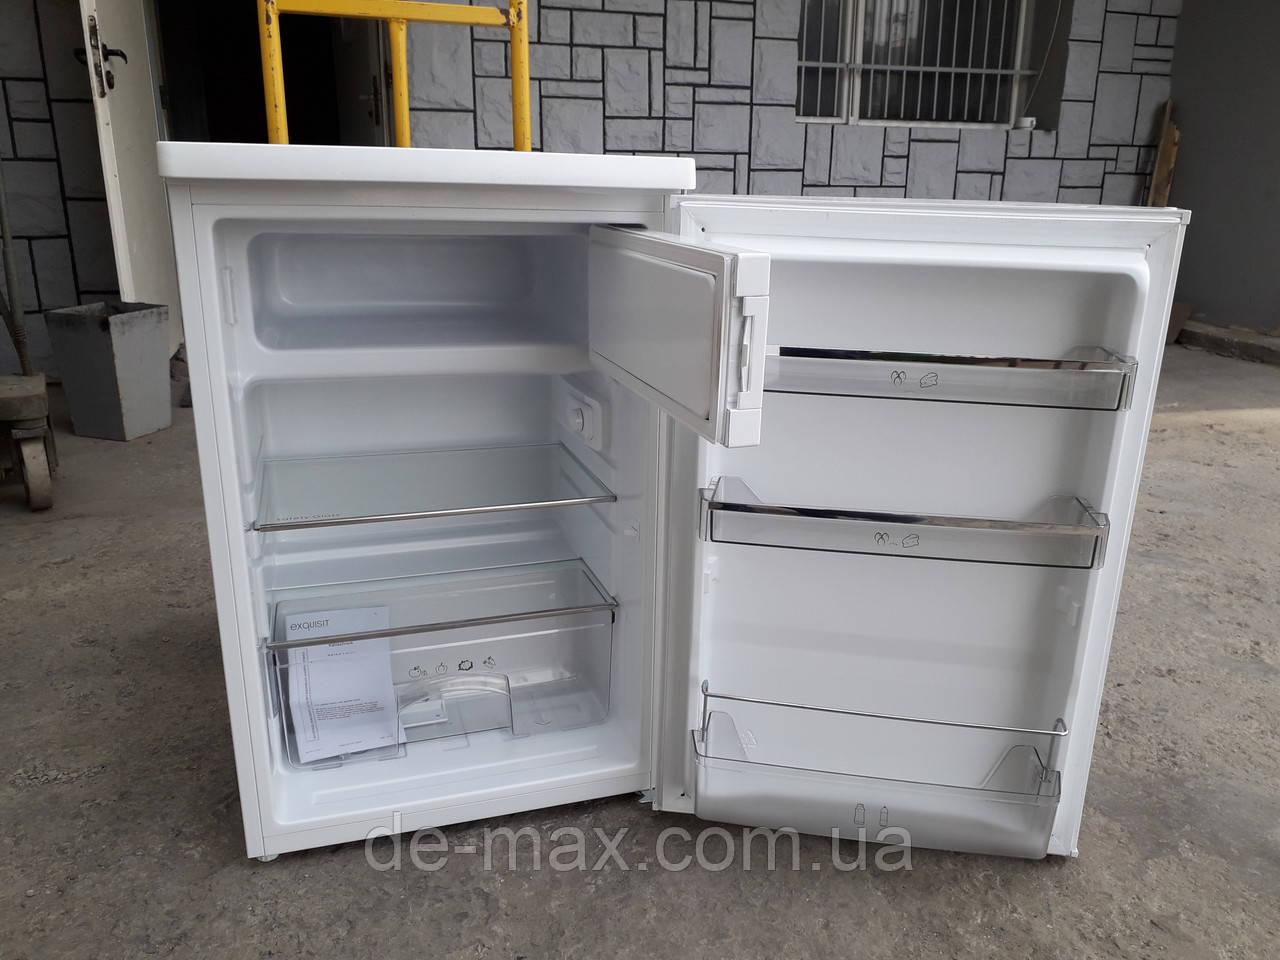 Холодильники  Exquisit KS 16 4.1 A+++  0,85м